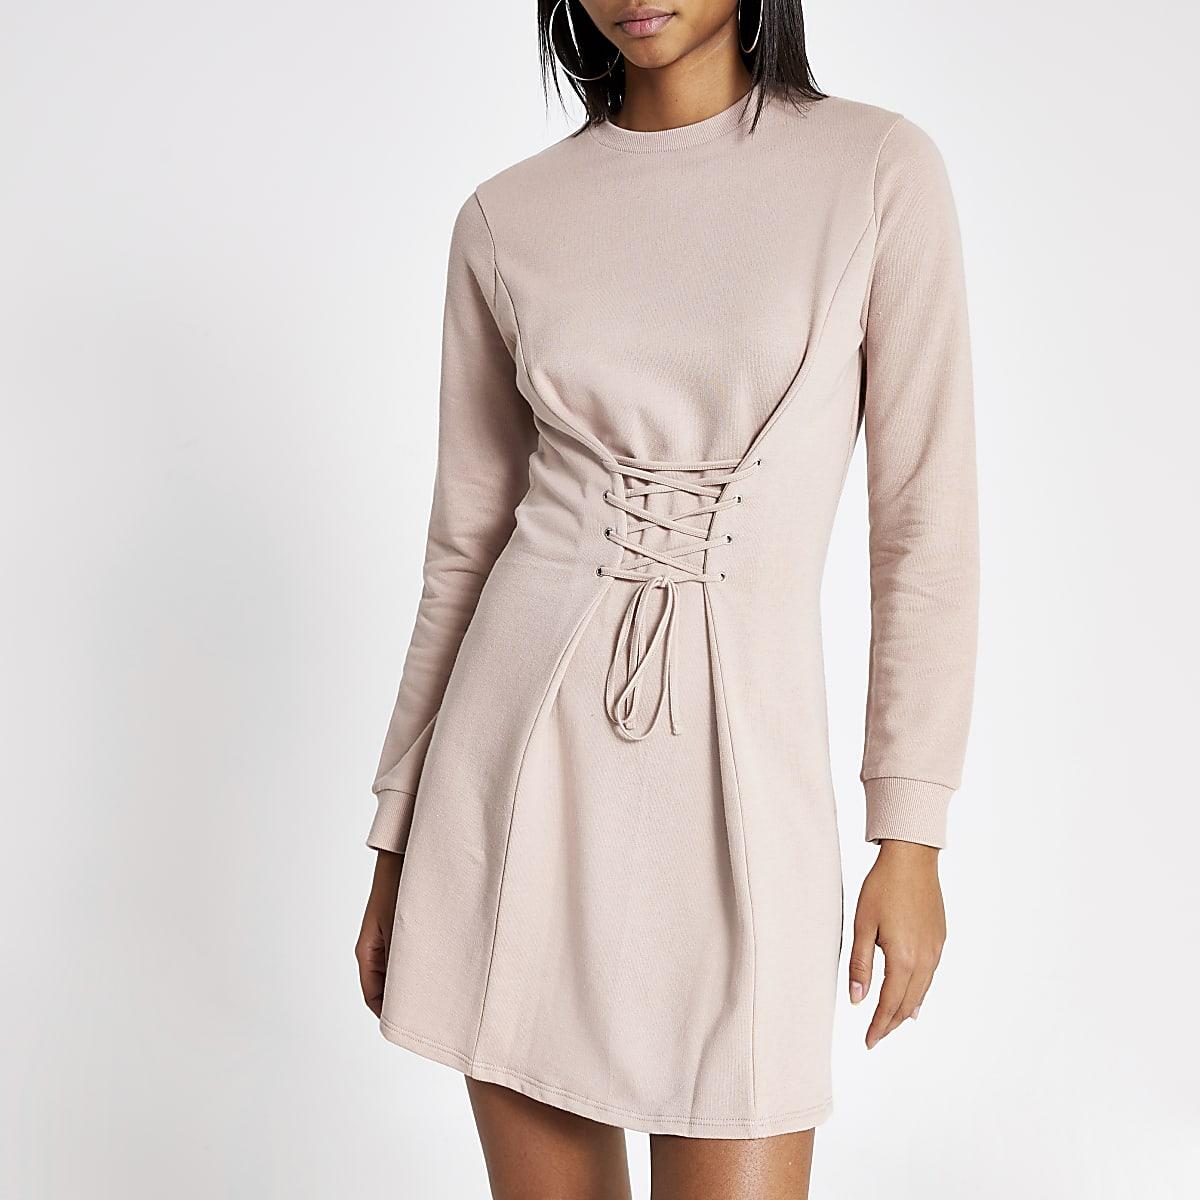 Pink corset sweater dress